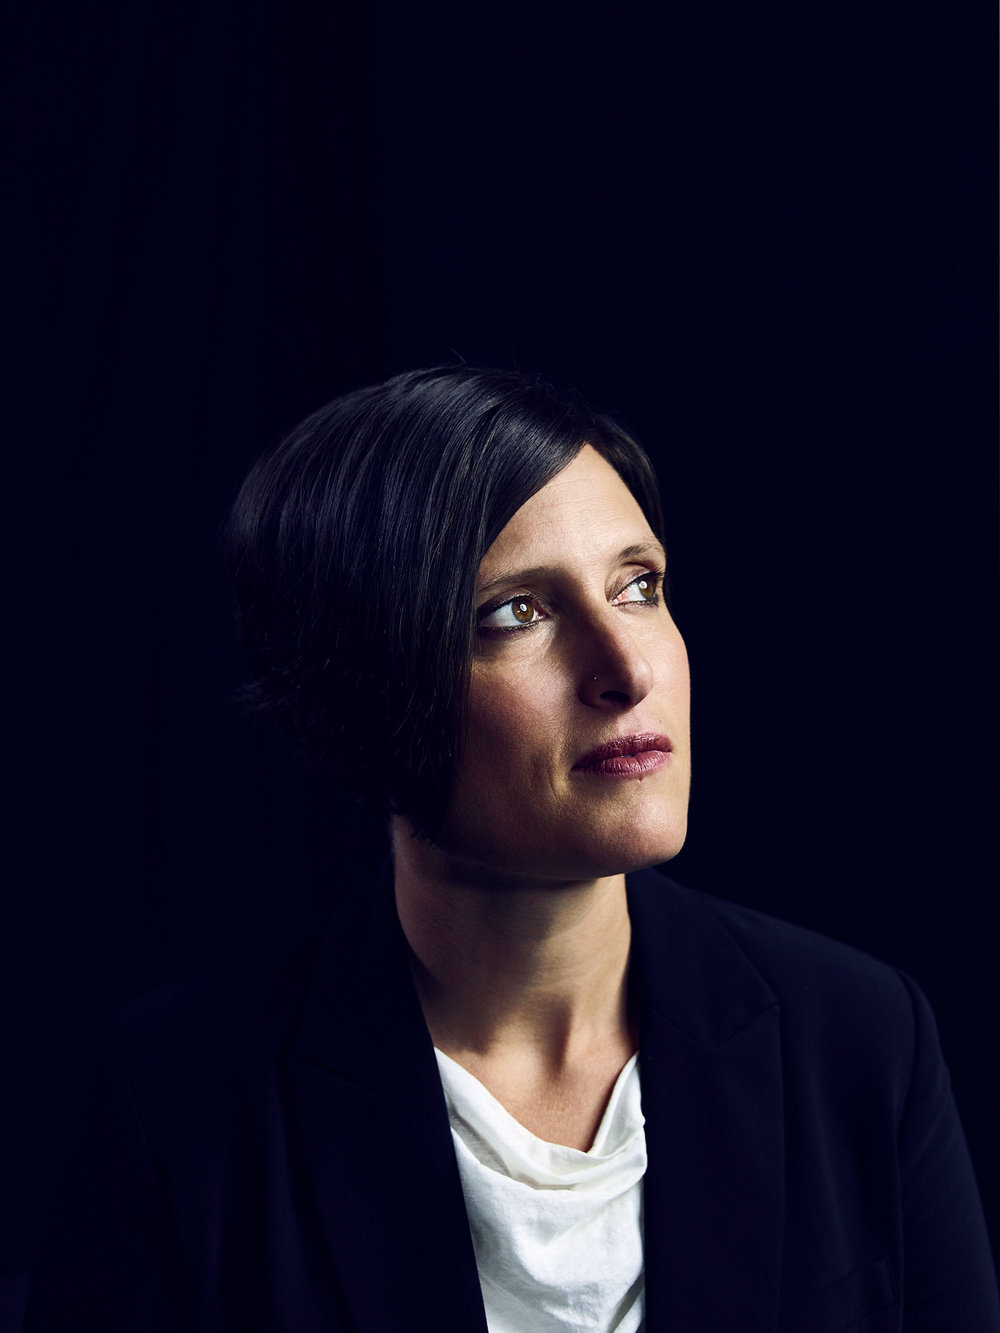 Rachel Morrison, Cinematographer, Los Angeles, California, 2017